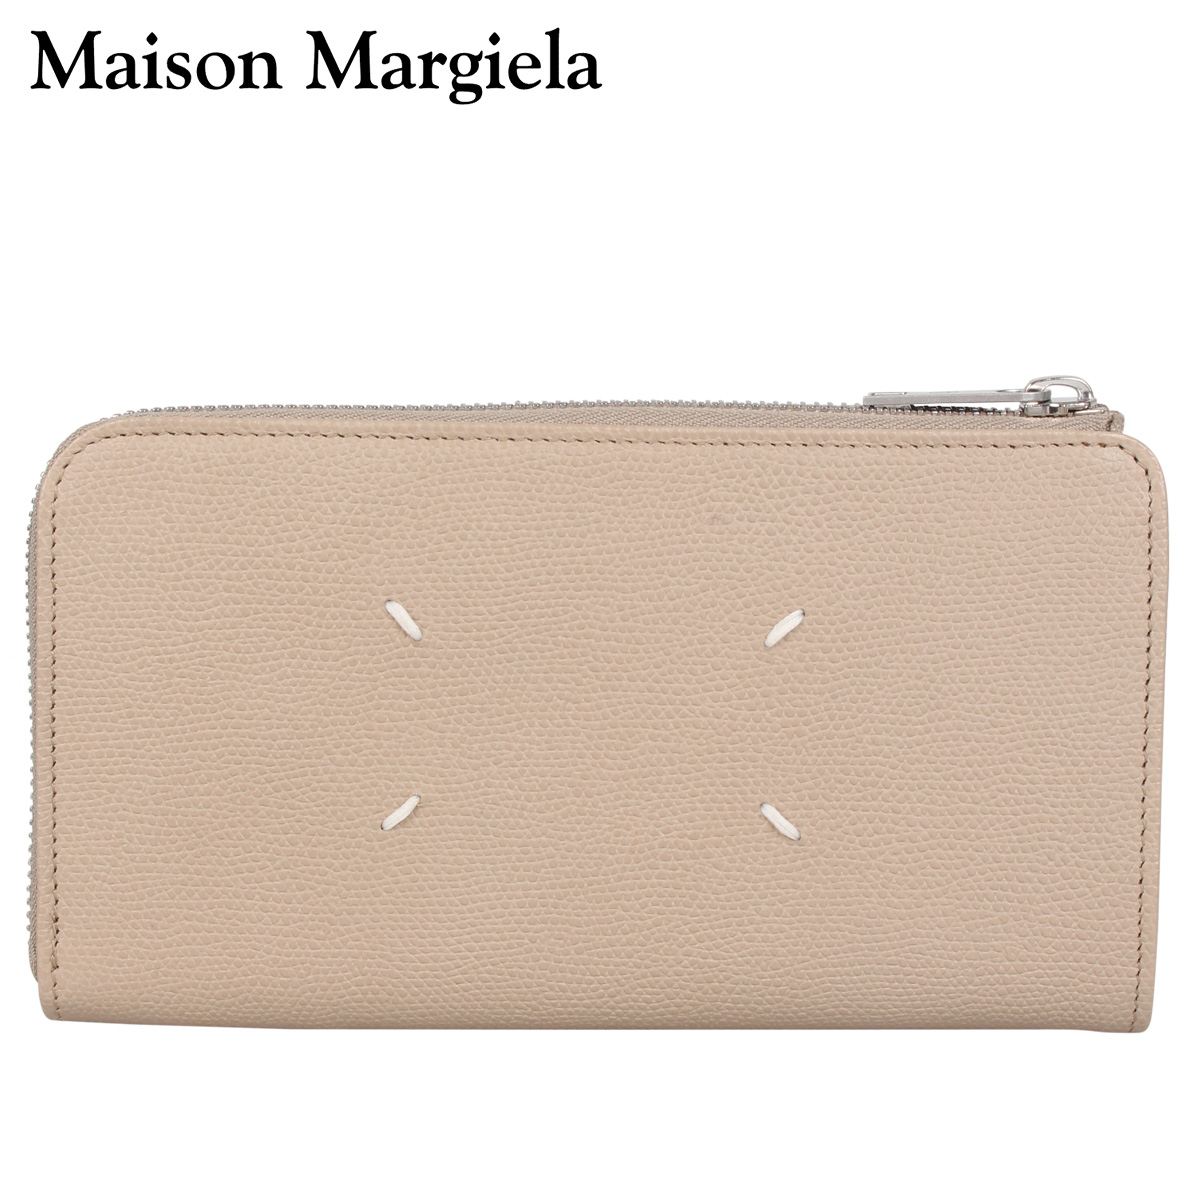 MAISON MARGIELA メゾンマルジェラ 財布 長財布 メンズ レディース LONG WALLET ベージュ S35UI0431-T2352 [3/4 新入荷]